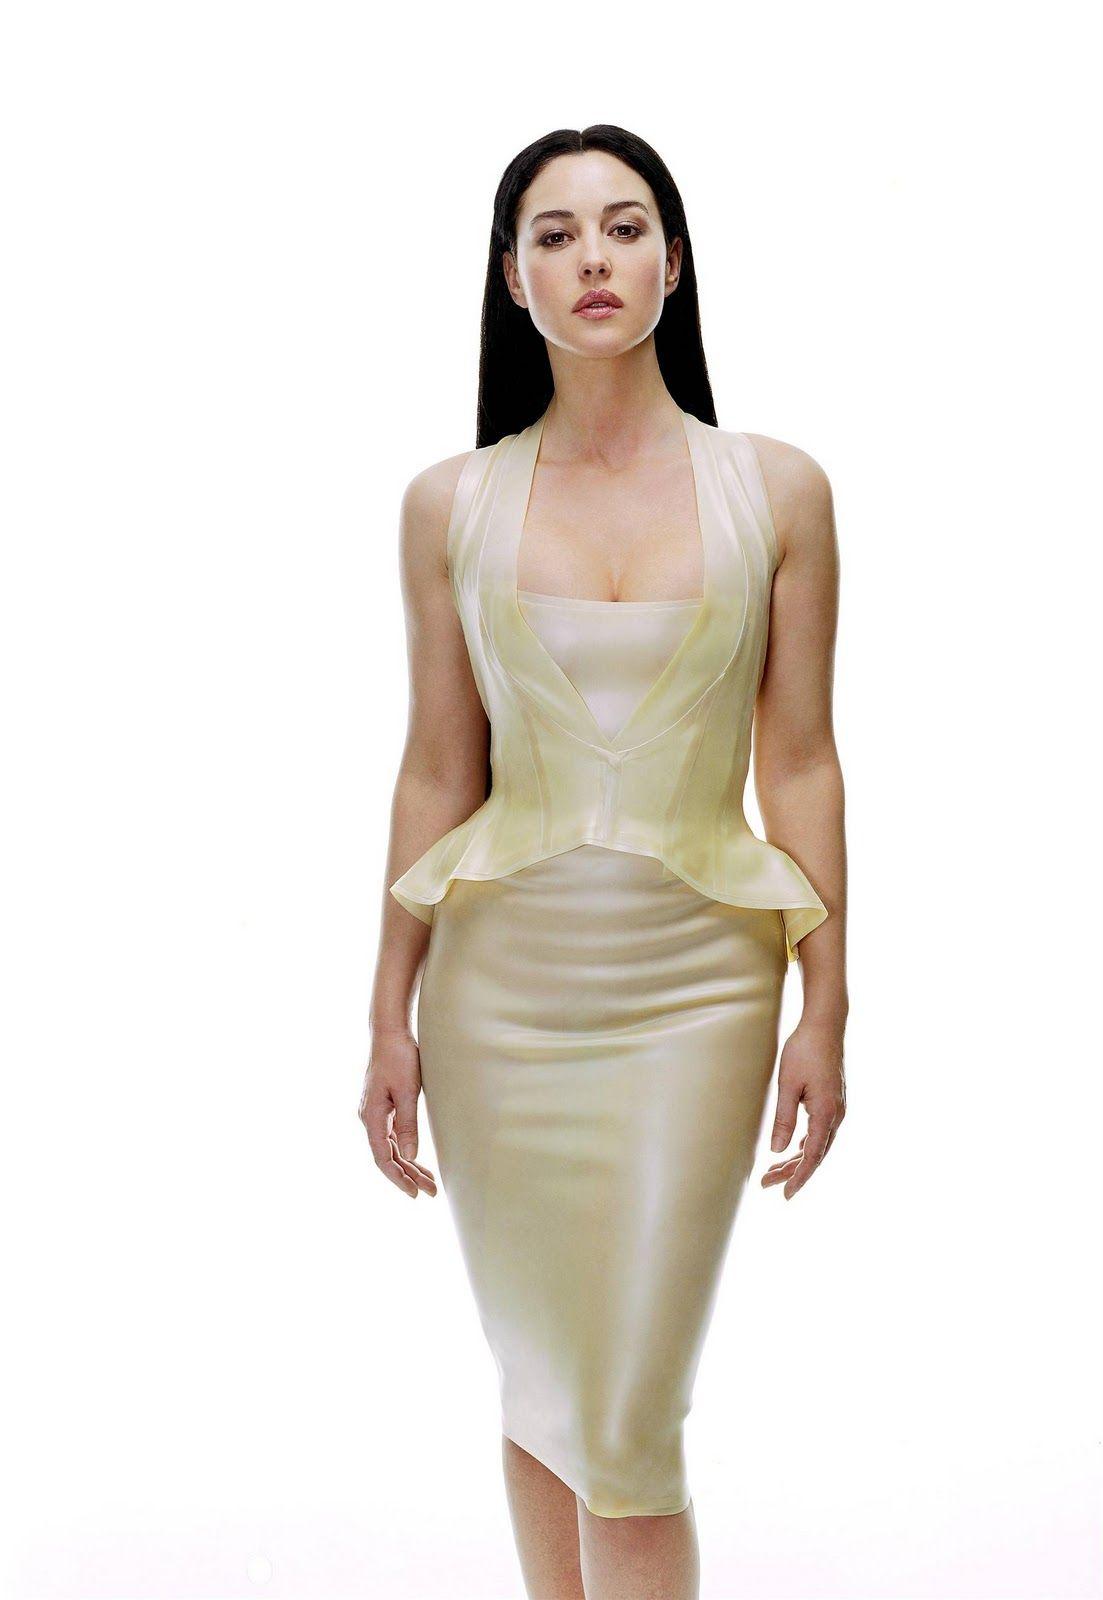 monica bellucci hot outfits